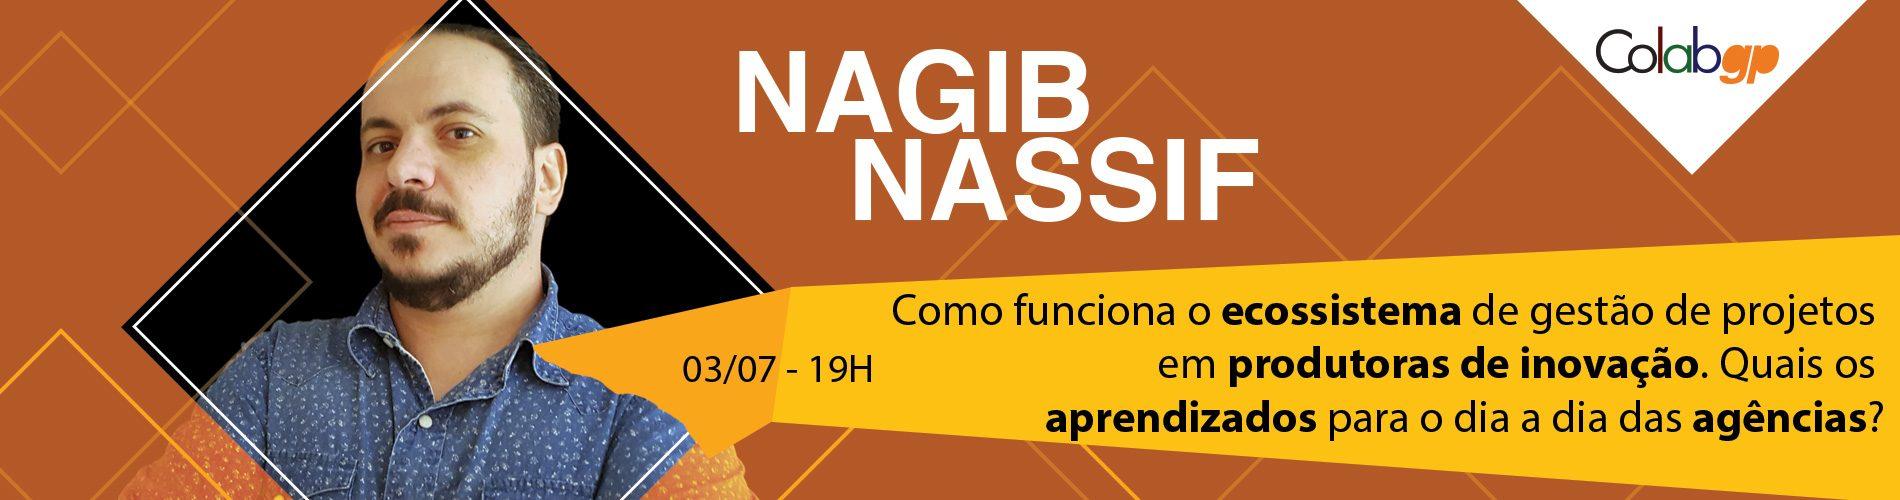 http://www.mestregp.com.br/wp-content/uploads/2017/04/collabHeaderEscuro_nagib2-1900x500.jpg